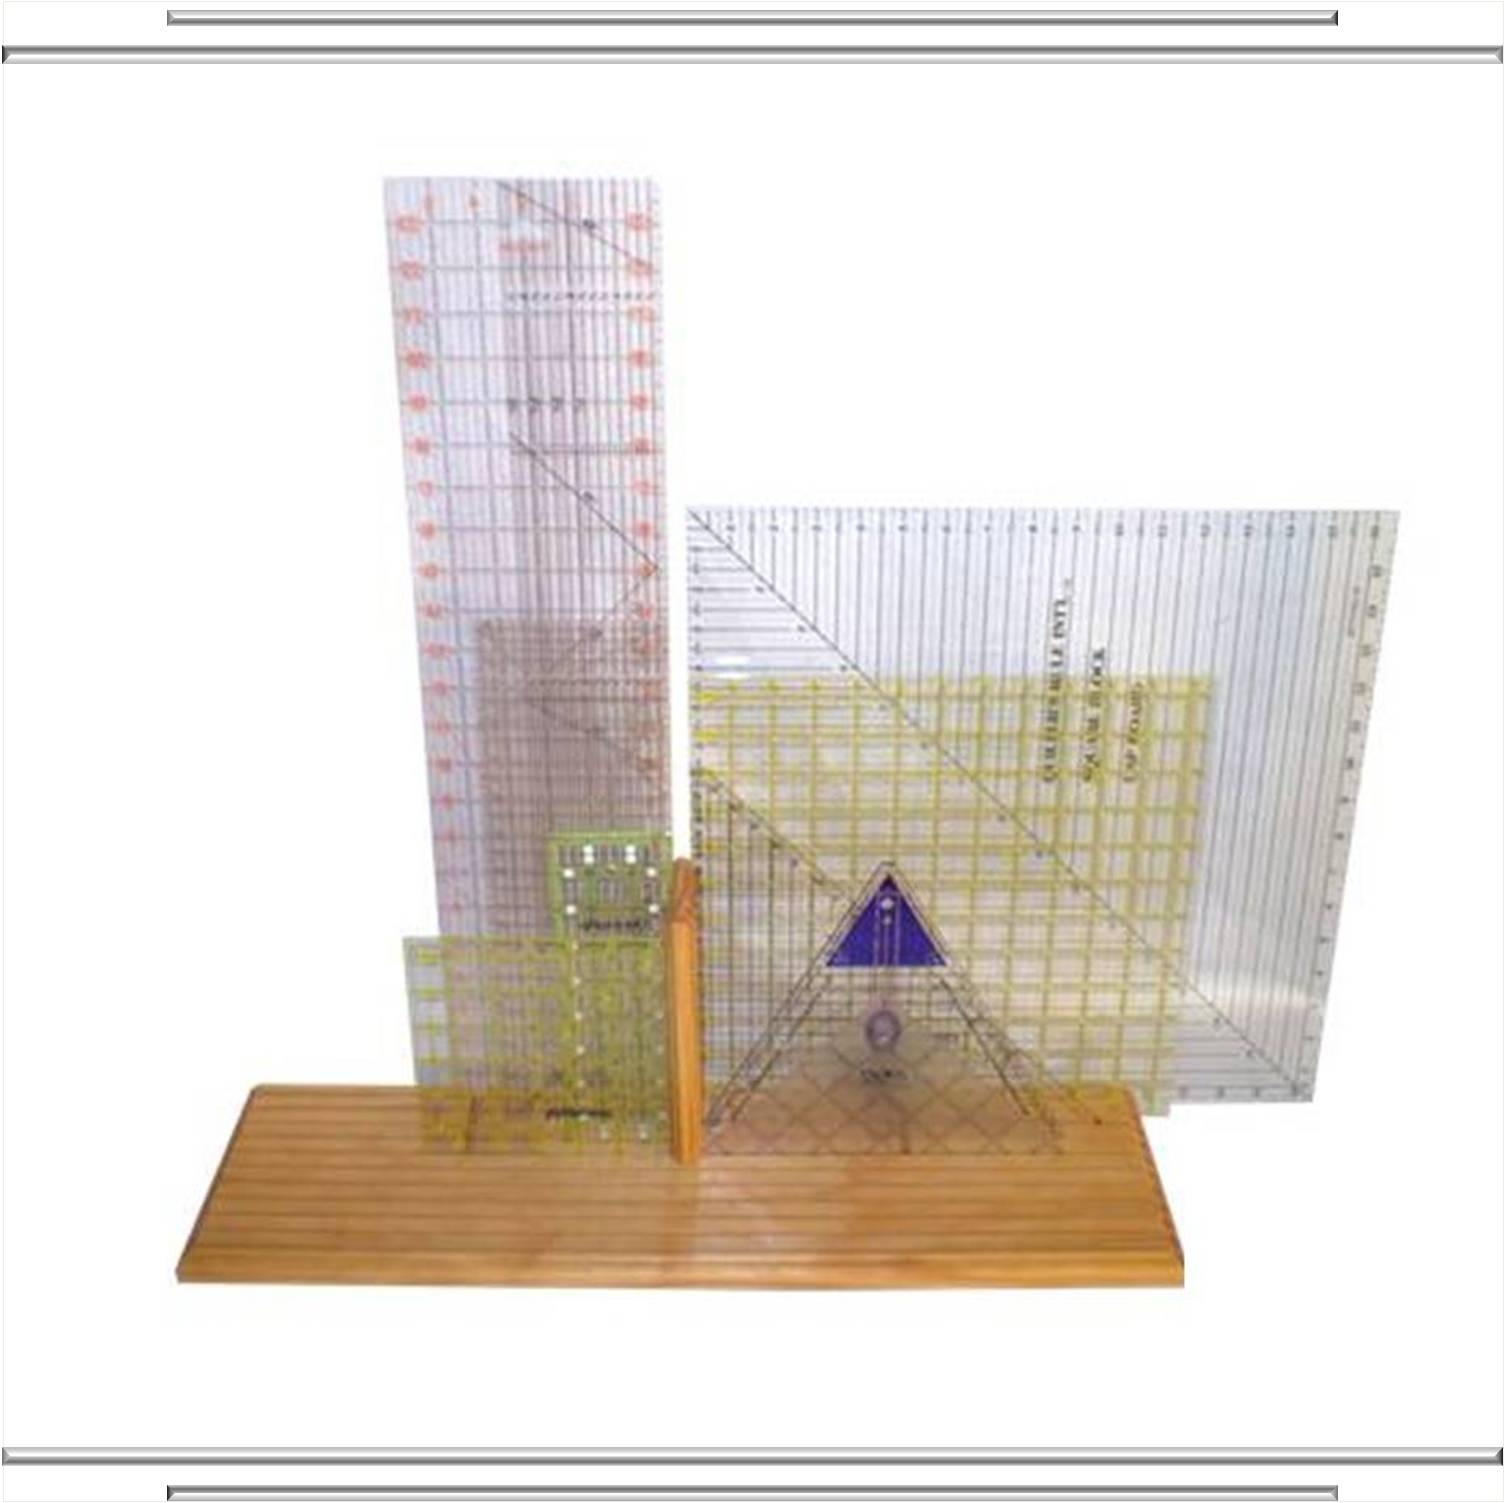 11 Slot No-Tip Tabletop Quilting Ruler Rack : quilt ruler holder - Adamdwight.com